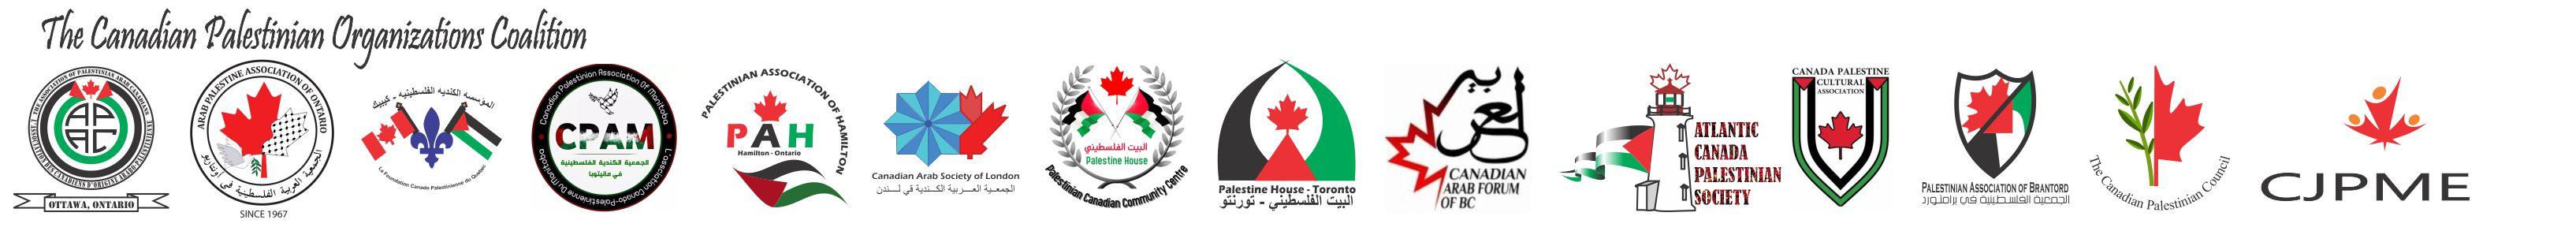 logos_(1).jpg